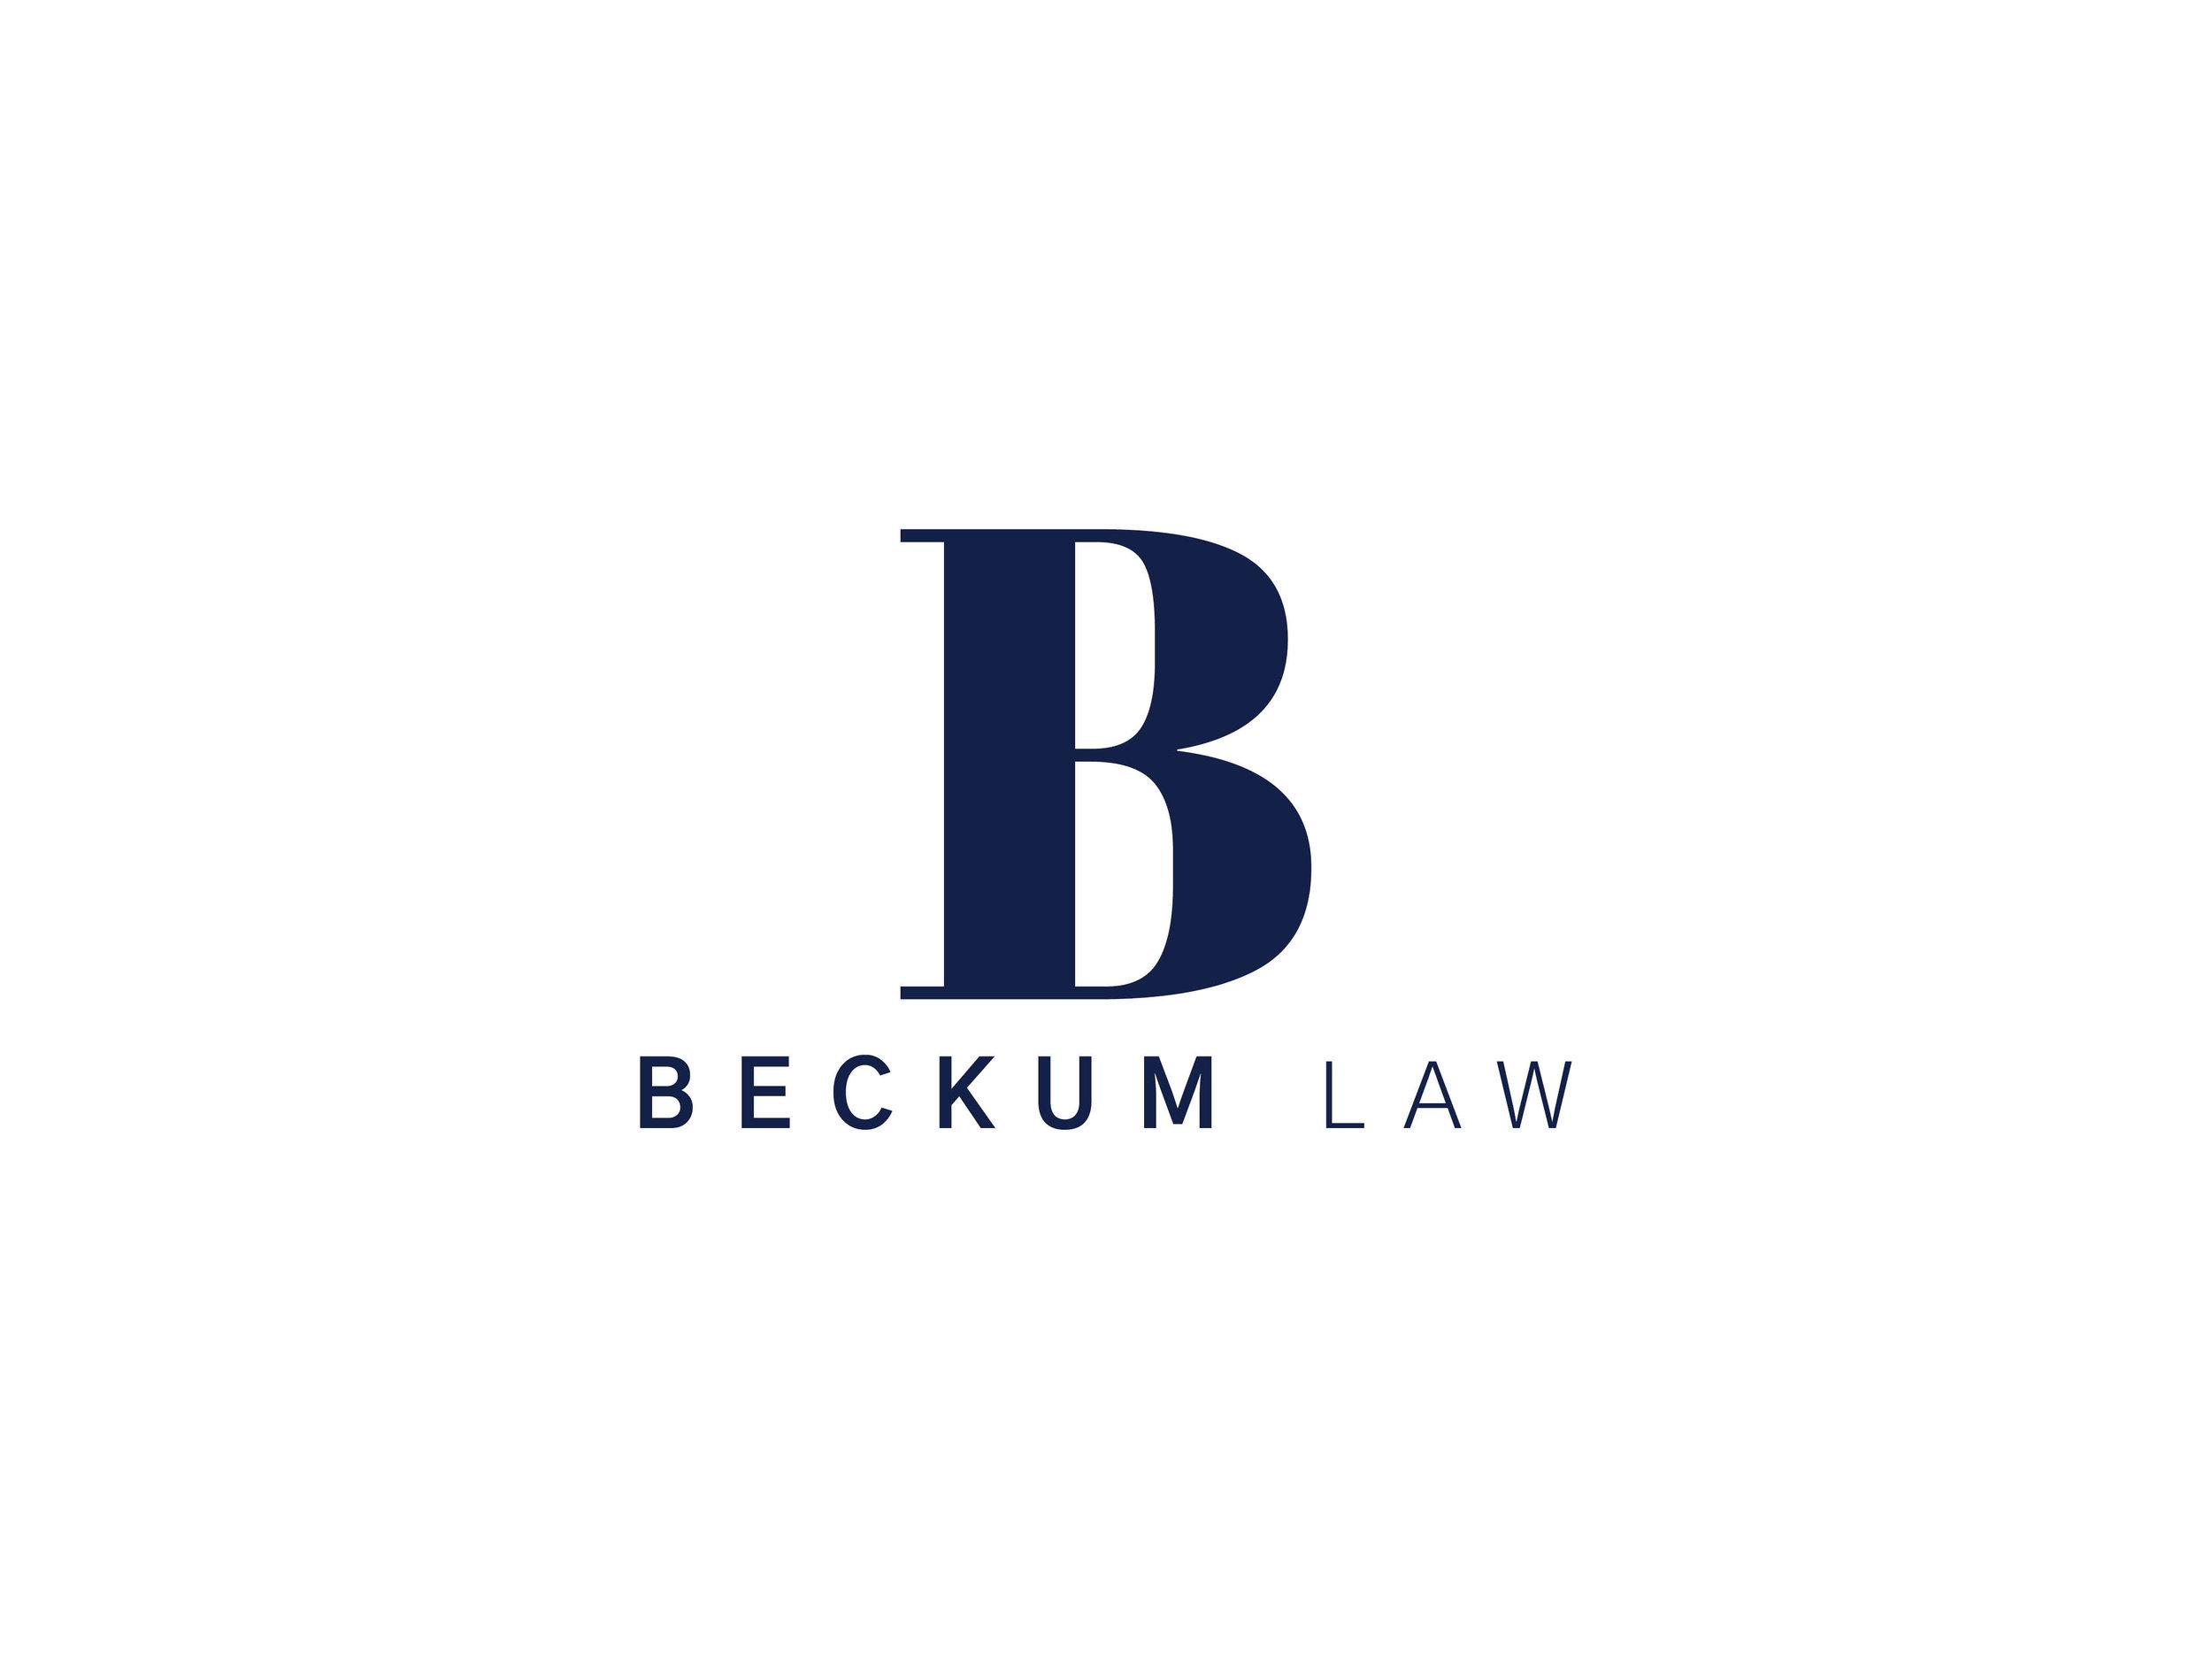 Beckum Law